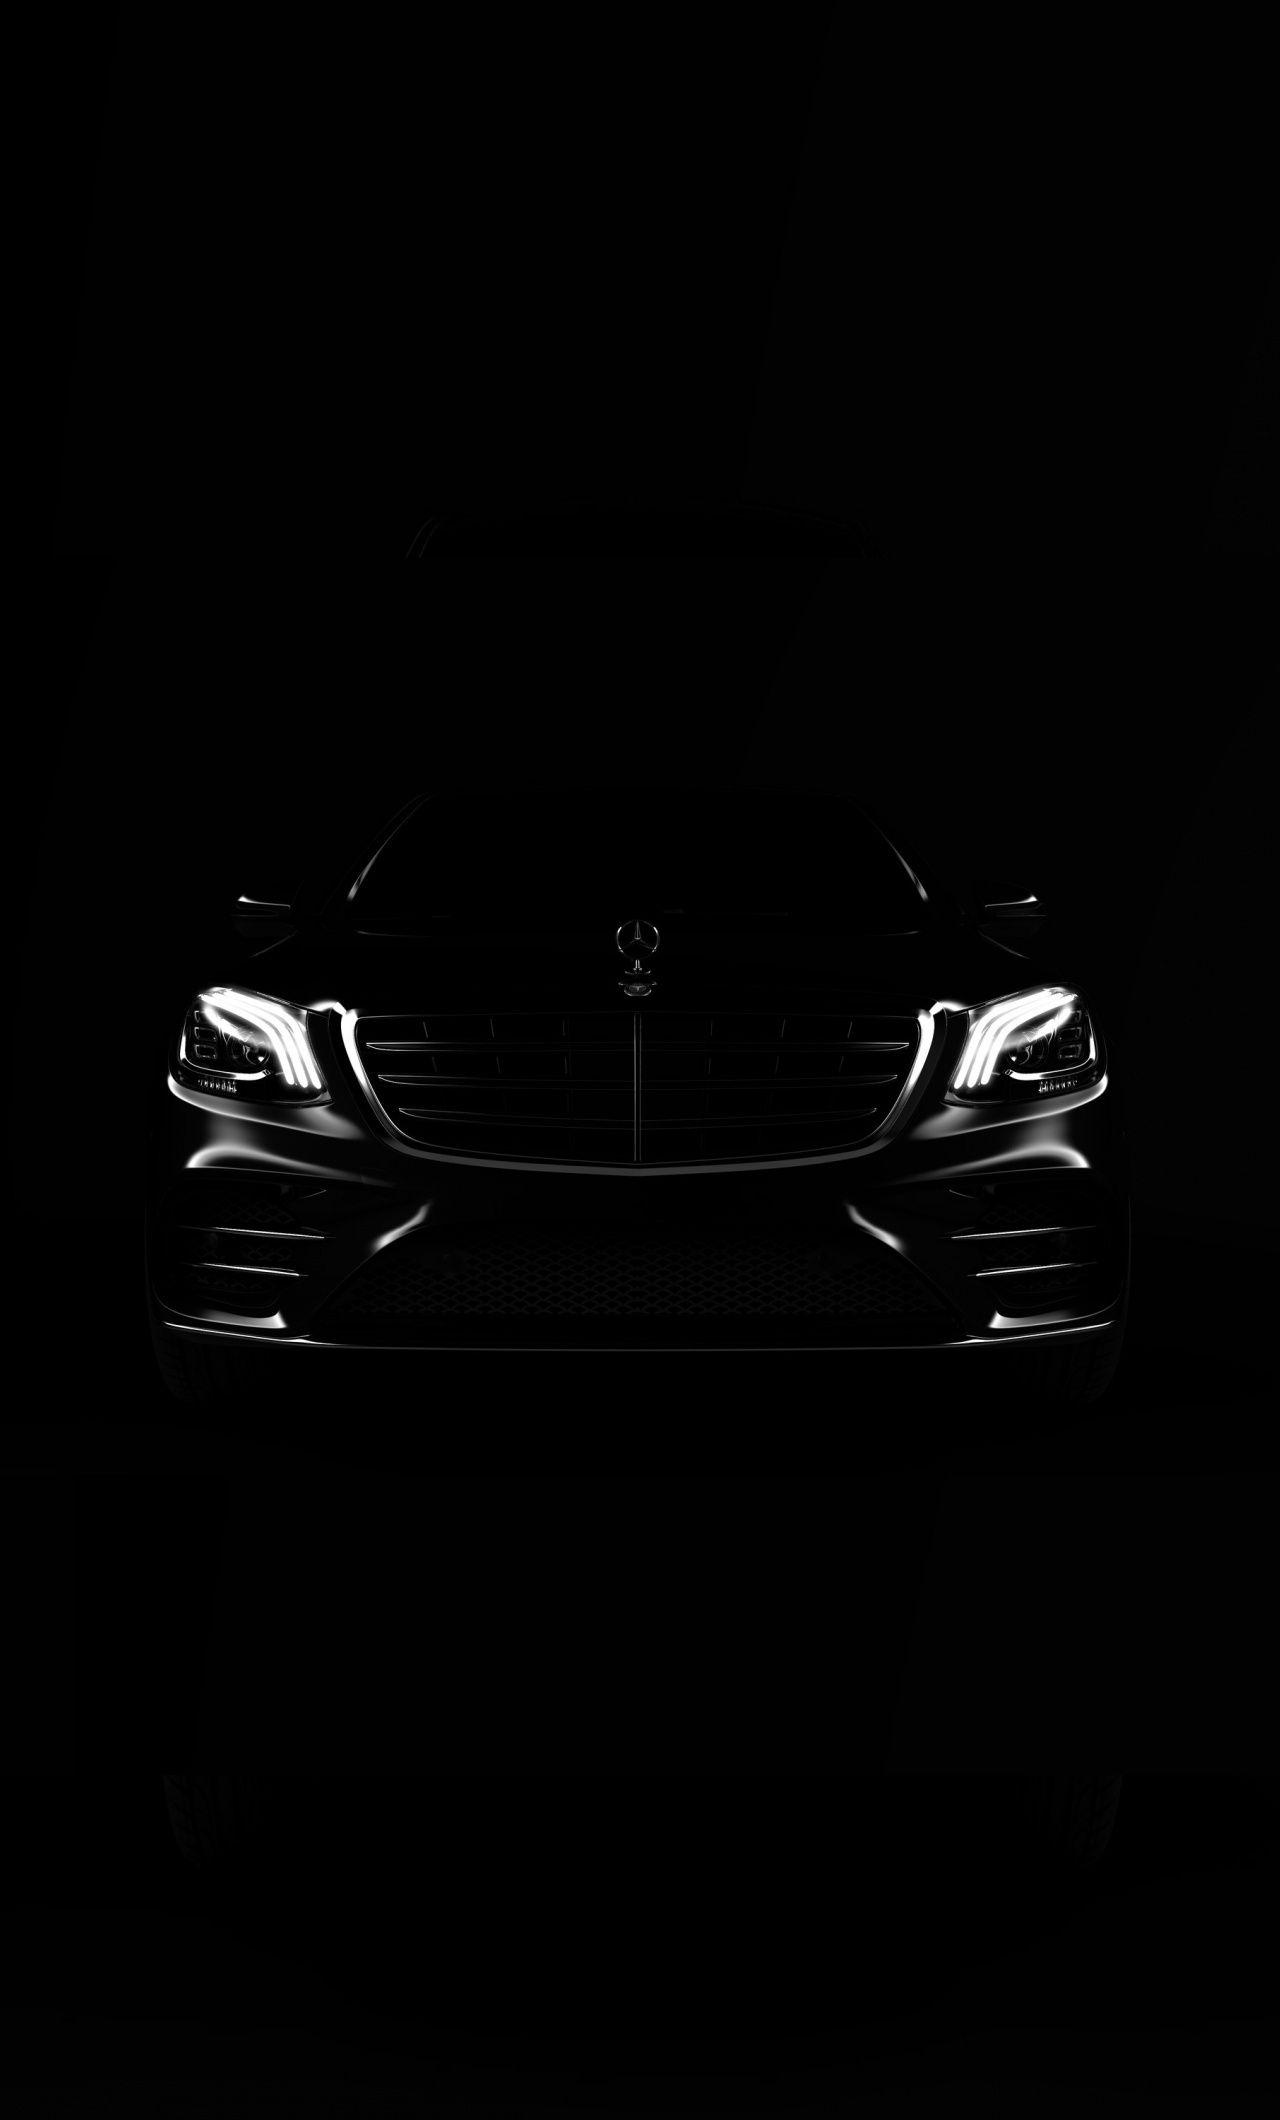 1280x2120 Portrait Dark Car Mercedes Benz Wallpaper S